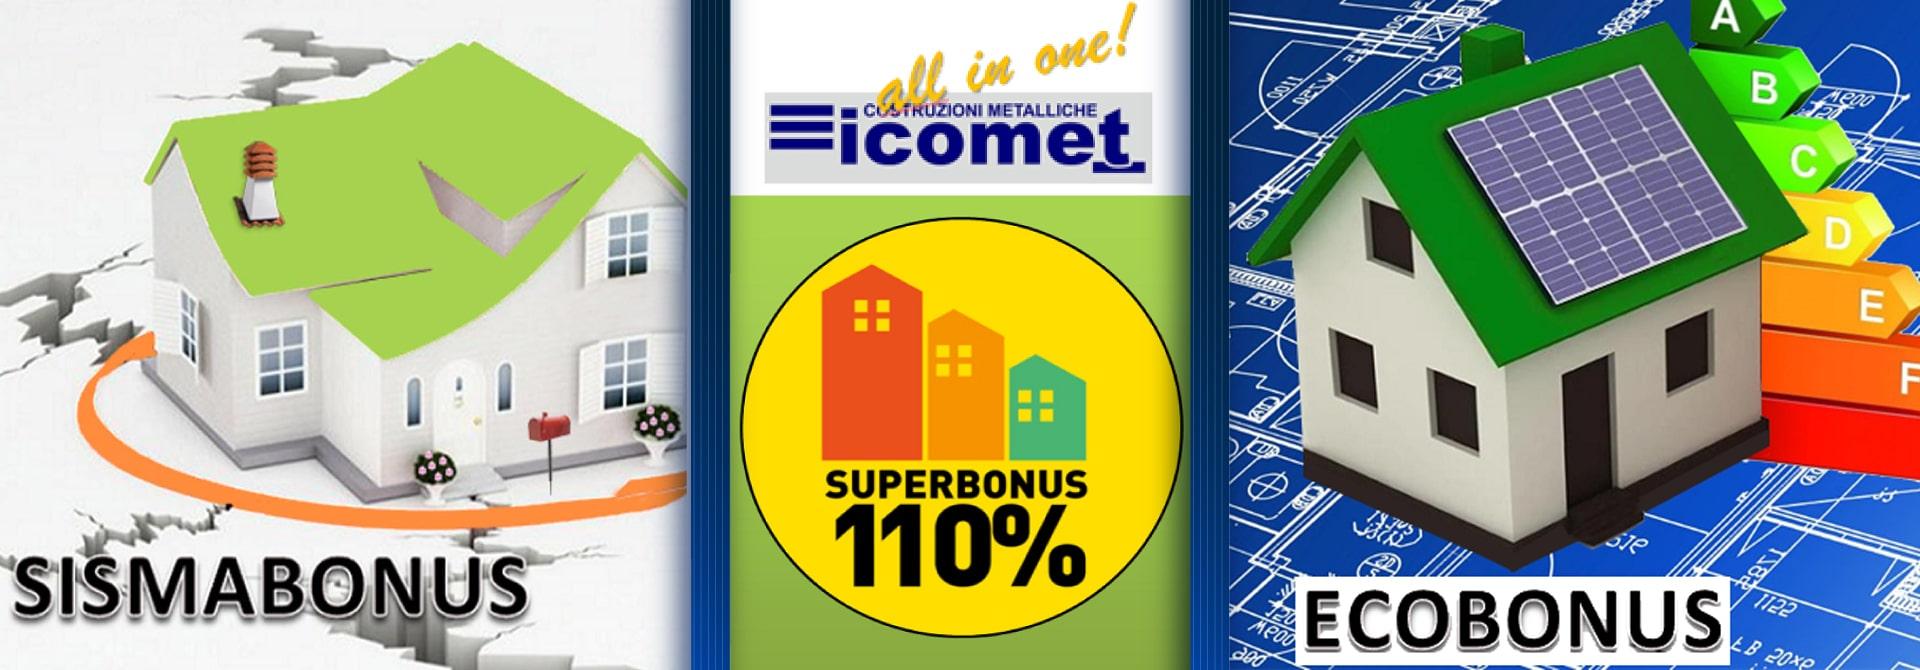 Superbonus 110% Icomet Costruzioni Metalliche